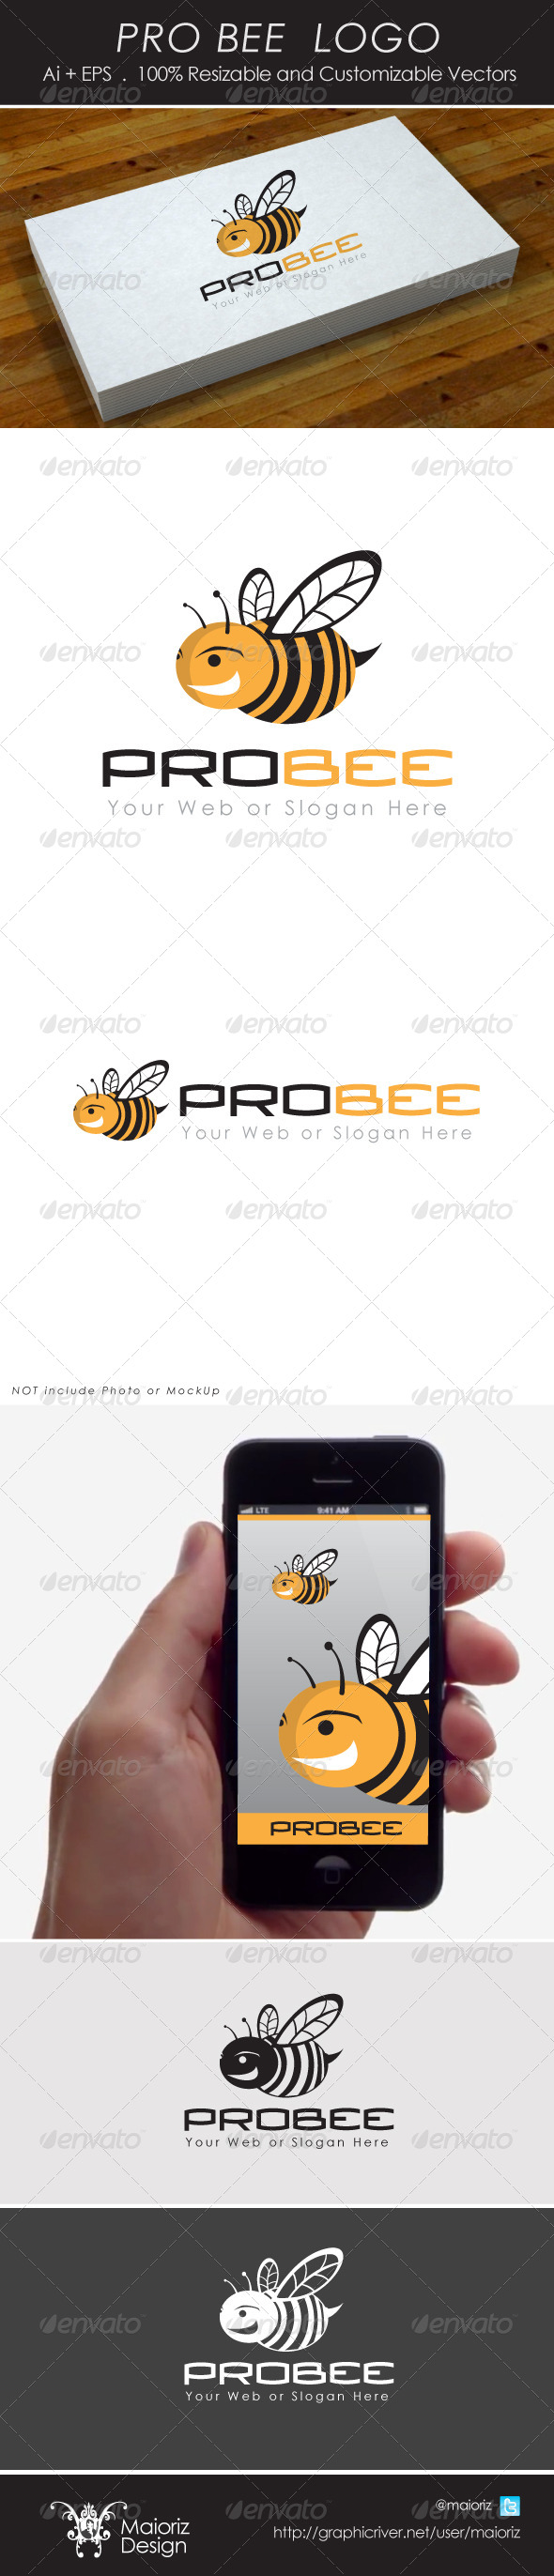 Pro Bee Logo